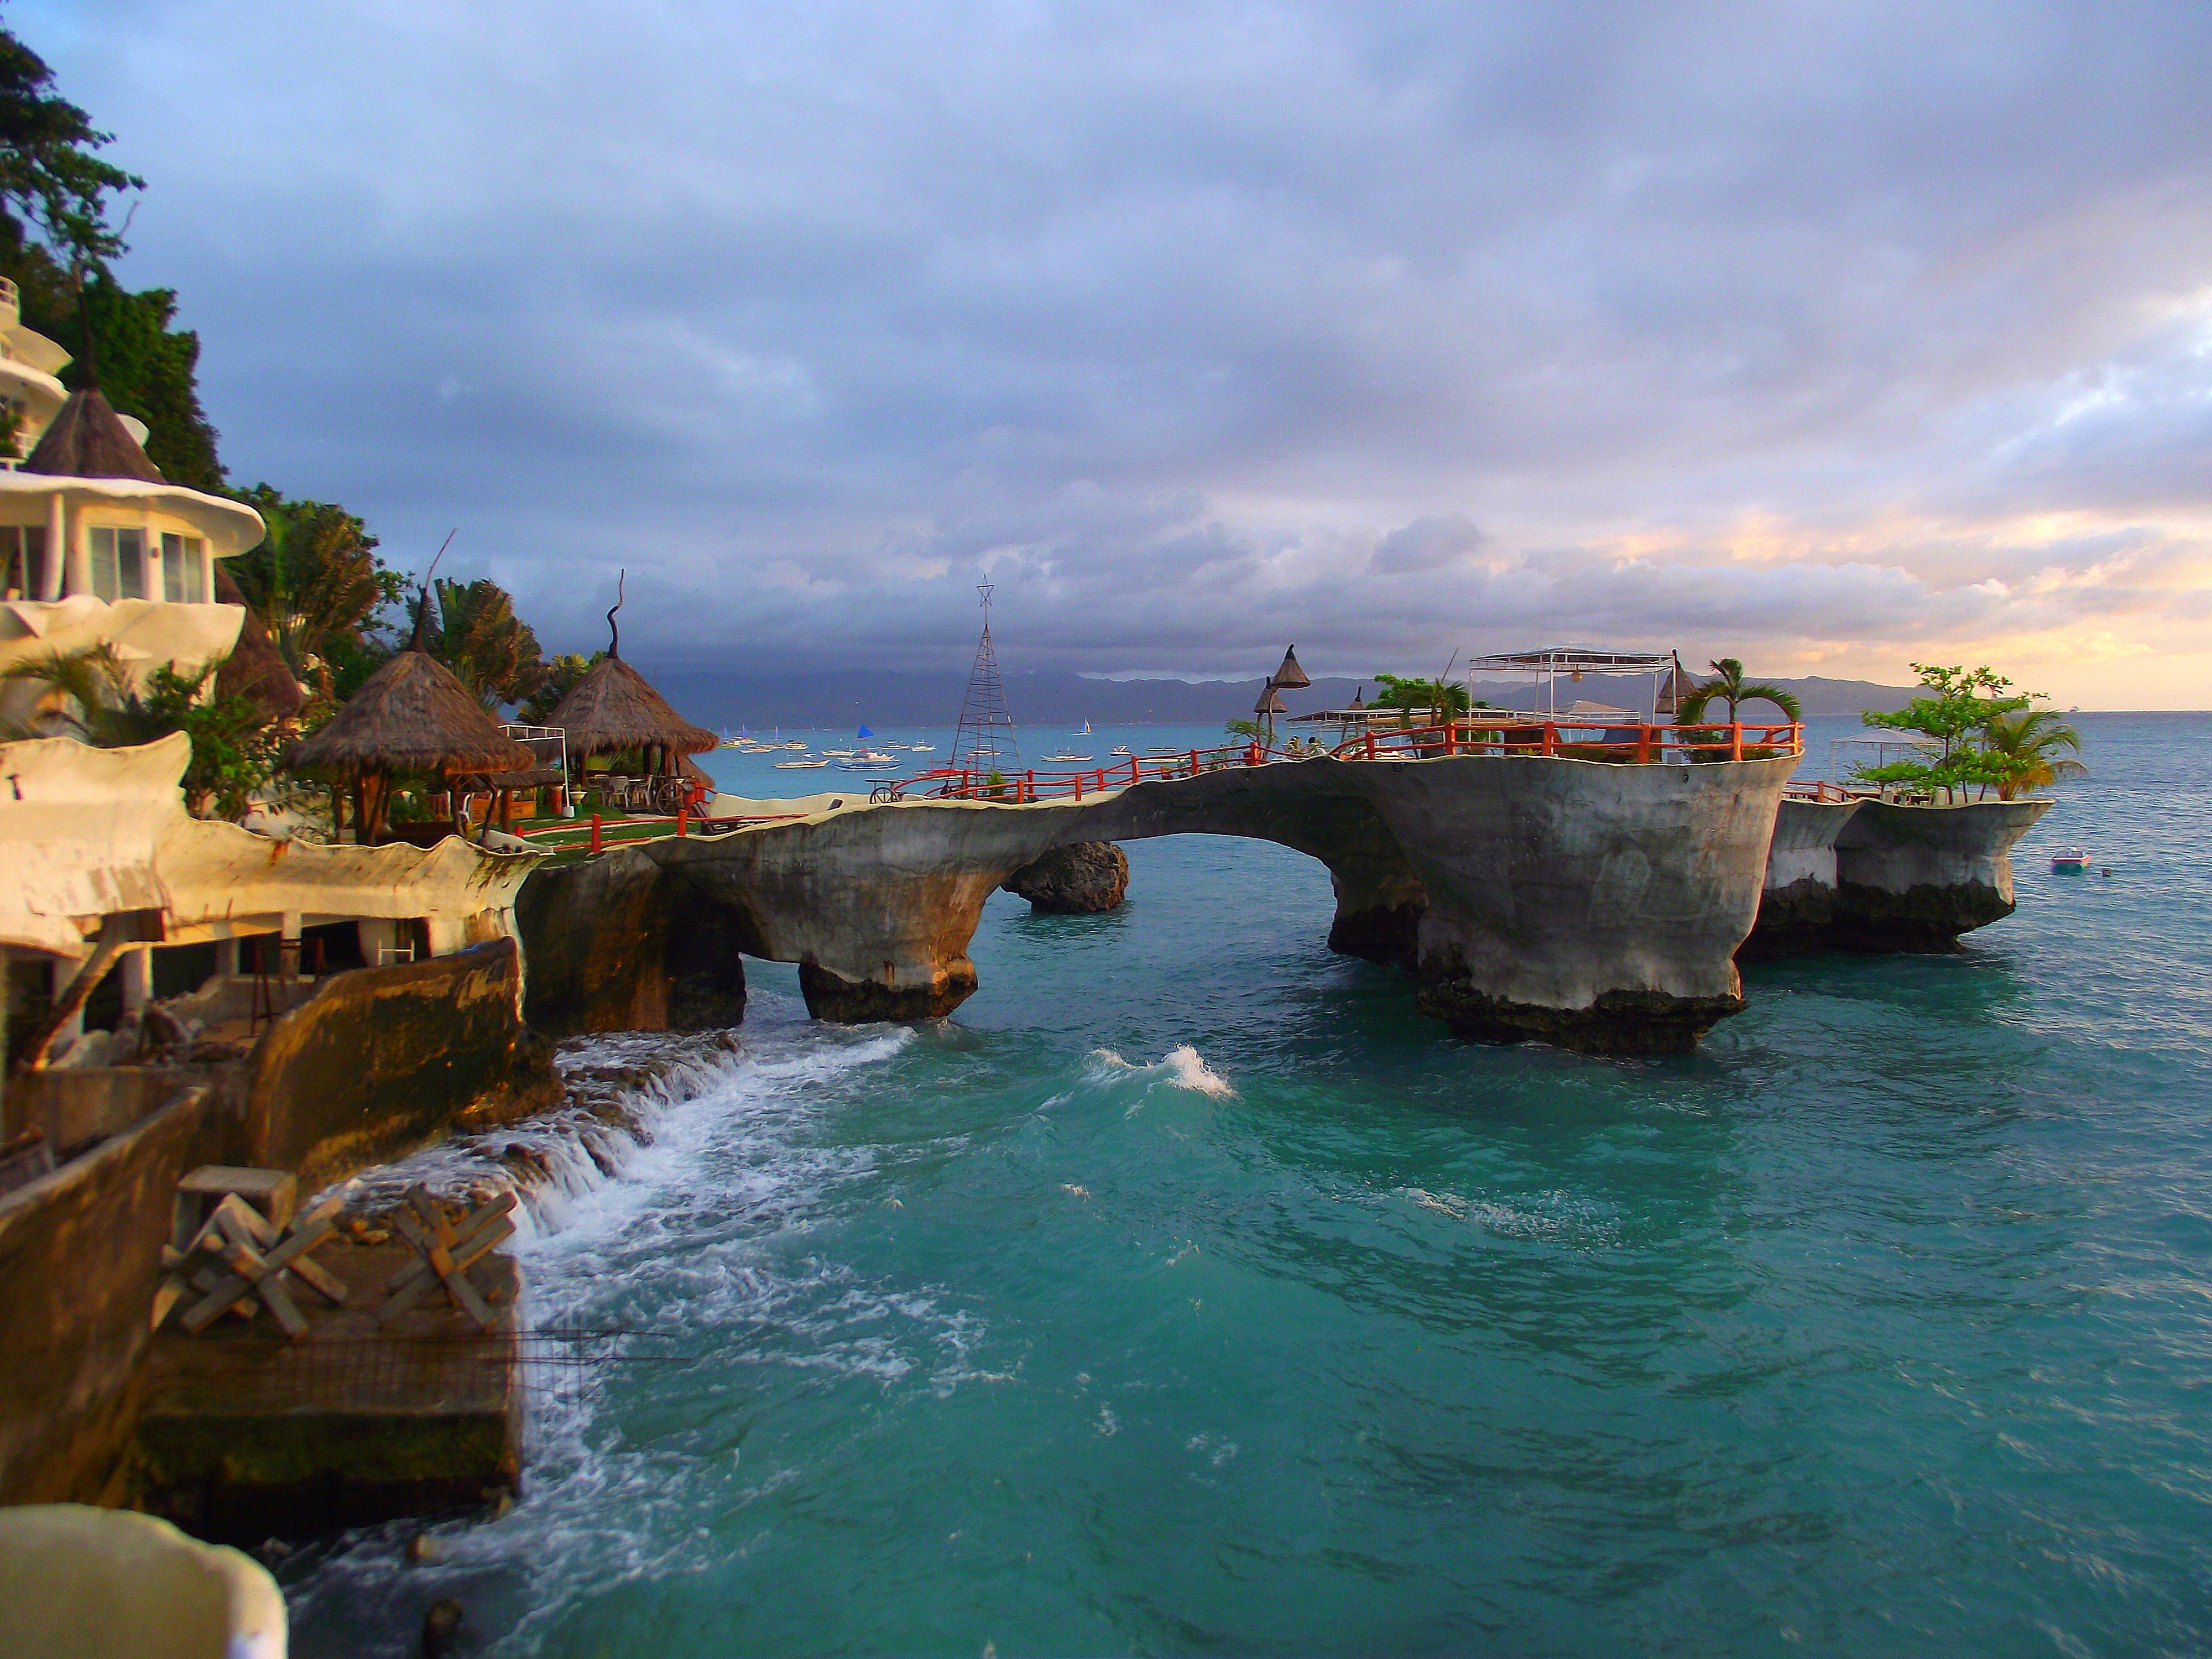 【i旅行】韦金勇:4天4000余元用英文9单词细游菲律宾宿务、薄荷、长滩等9岛6城镇(下篇) 一、简述 2013年11月28日12日1日4天里,我花了4000余元,6次飞行,用英文9个单词,很仔细地游览了菲律宾宿务、薄荷、长滩等9岛6城镇。 6次飞行:上海往返马尼拉、马尼拉往返宿务、马尼拉往返长滩。 9岛6城镇:9岛吕宋岛、麦克坦岛、宿务岛、薄荷岛、邦劳岛、巴黎卡萨岛、处女岛、班乃岛、长滩岛。马尼拉、宿务、塔克比兰、长滩、卡迪兰克、卡里波。 说是只会英文9个单词,当然不止,也没统计过,至少英语极差极